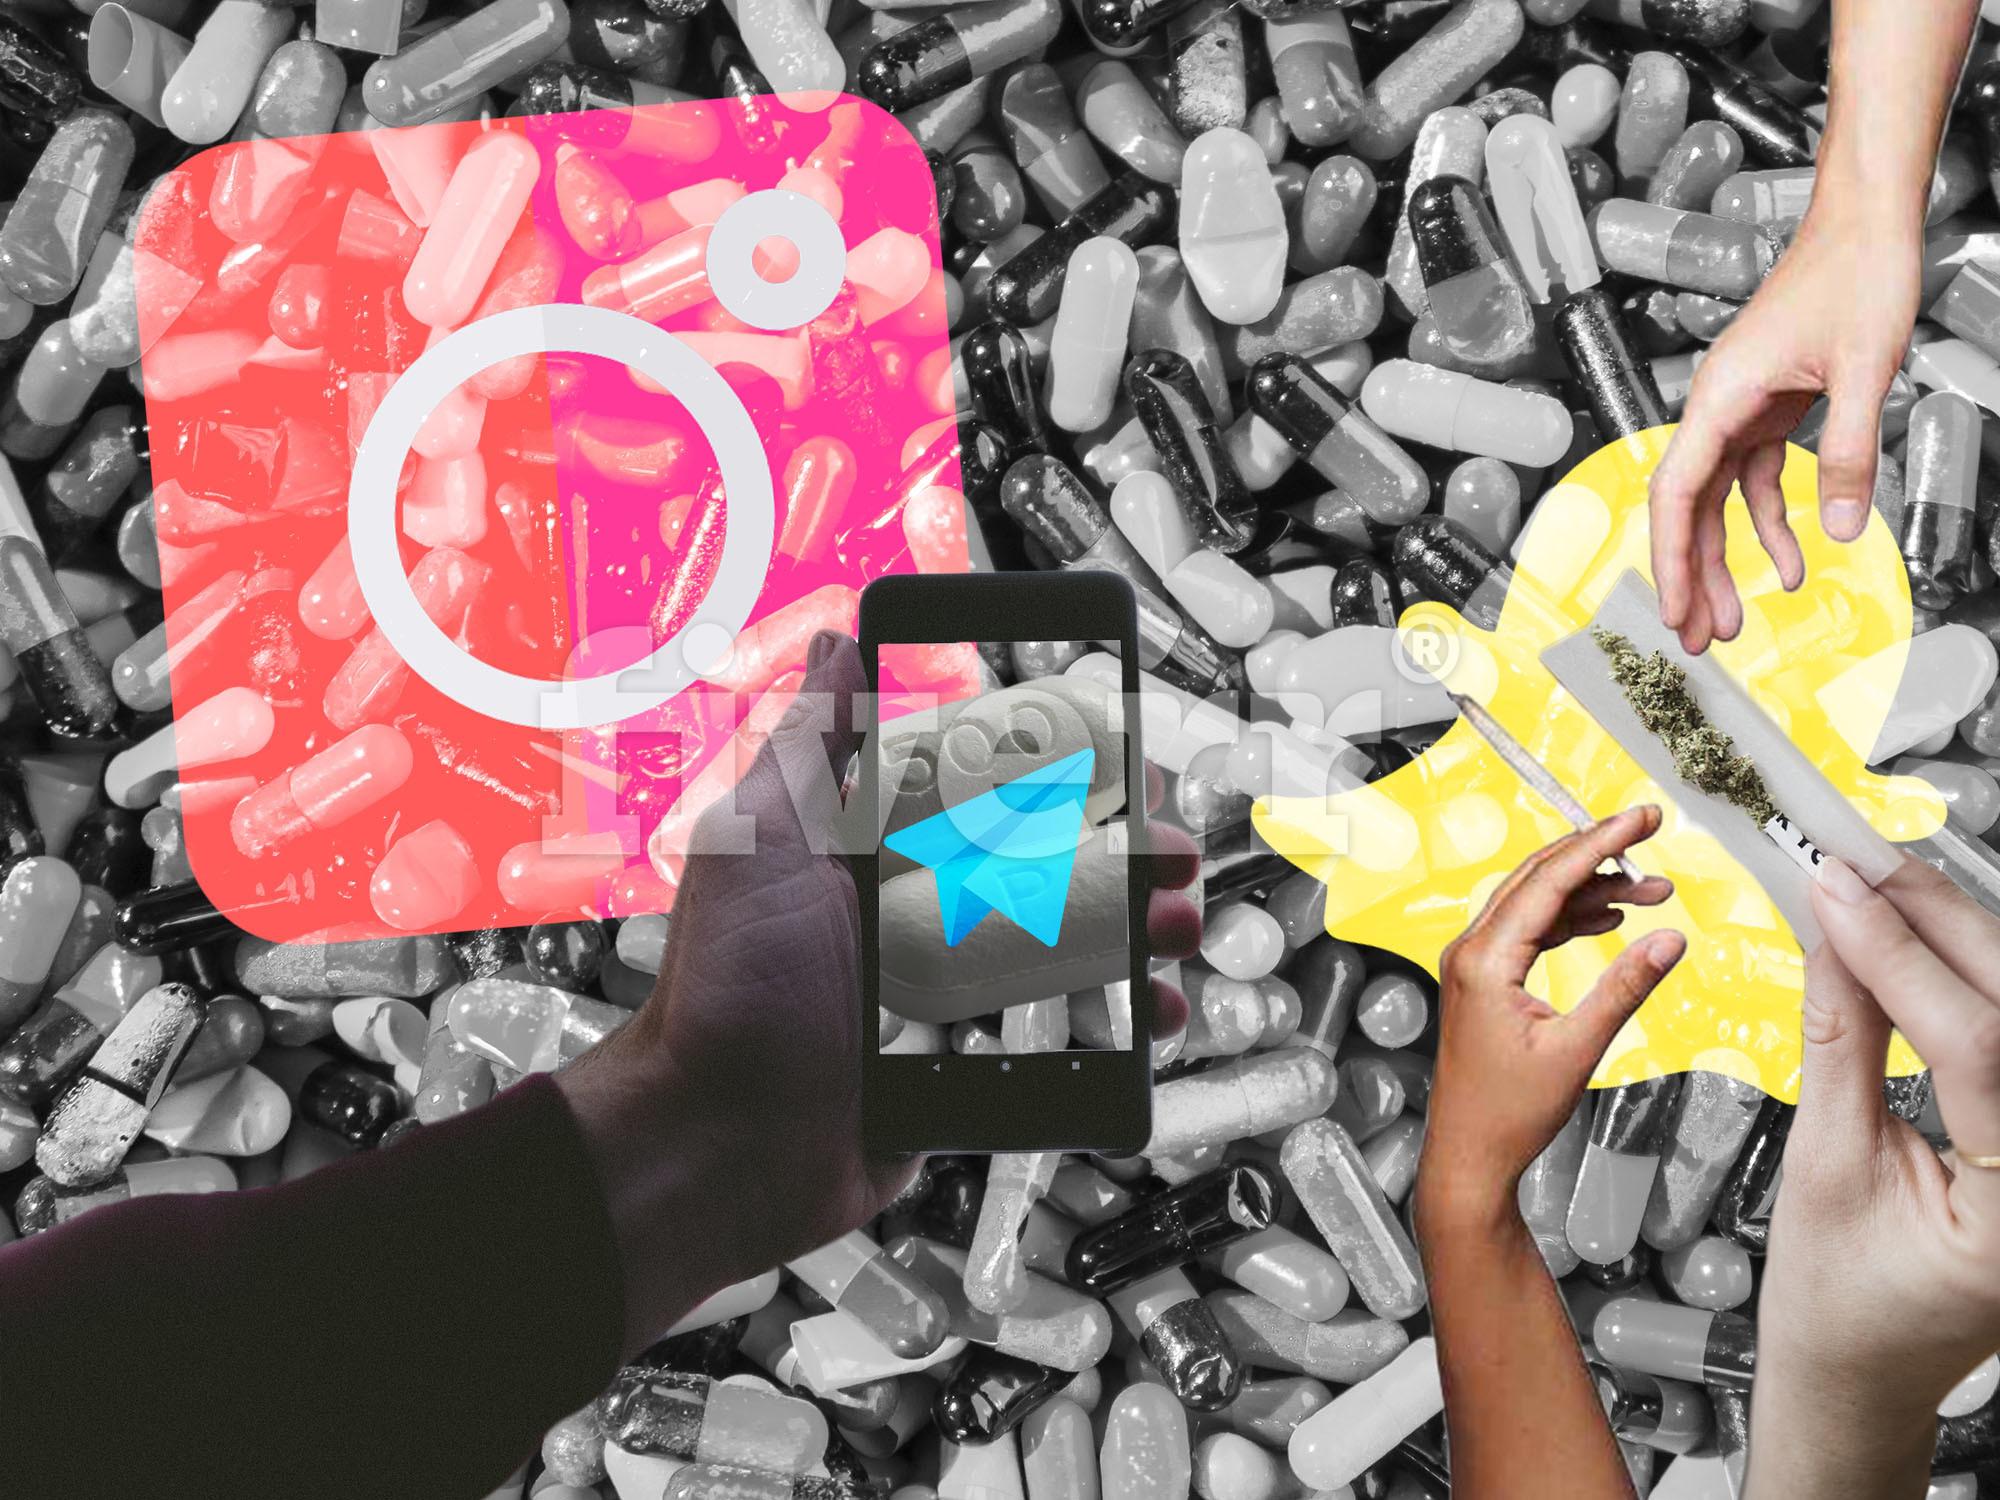 fiverr_drugs_collage_2.jpg